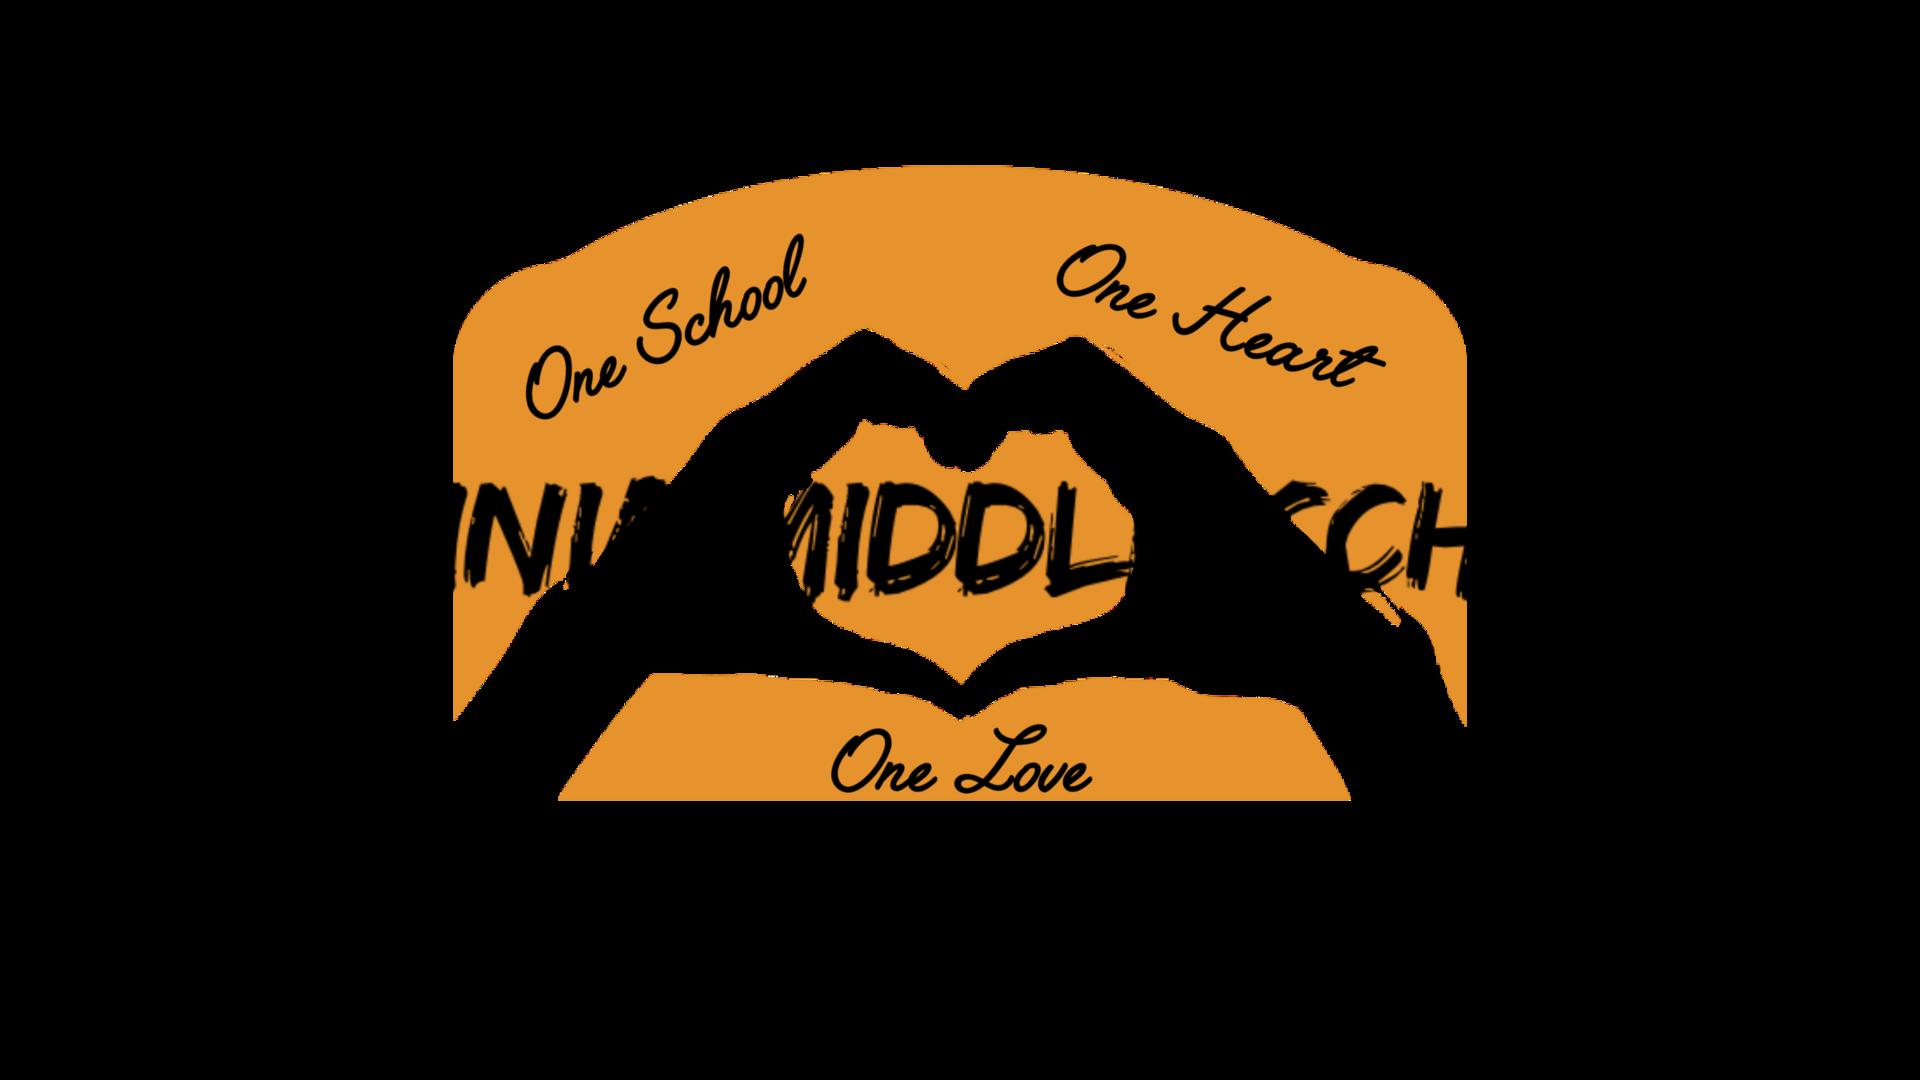 VMS One School, One Heart, One Love